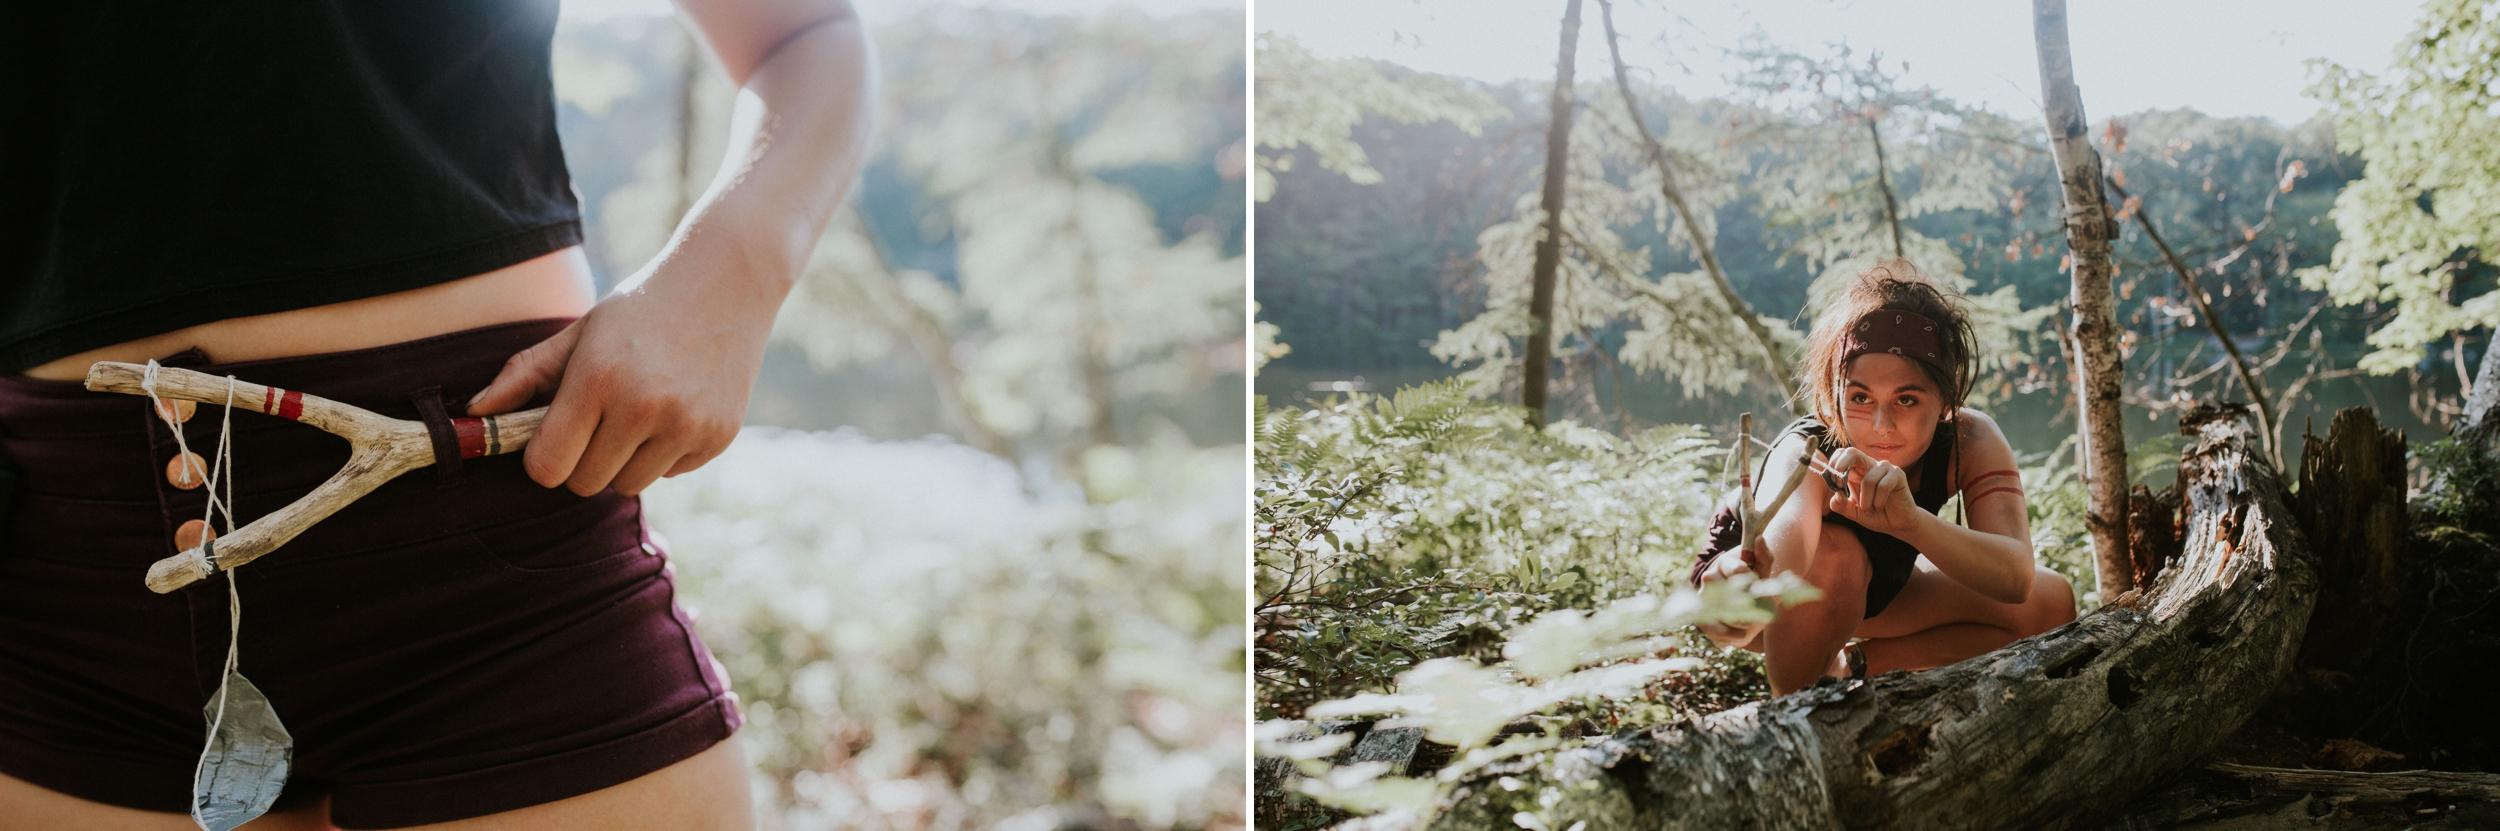 Lost Boys 4.jpg